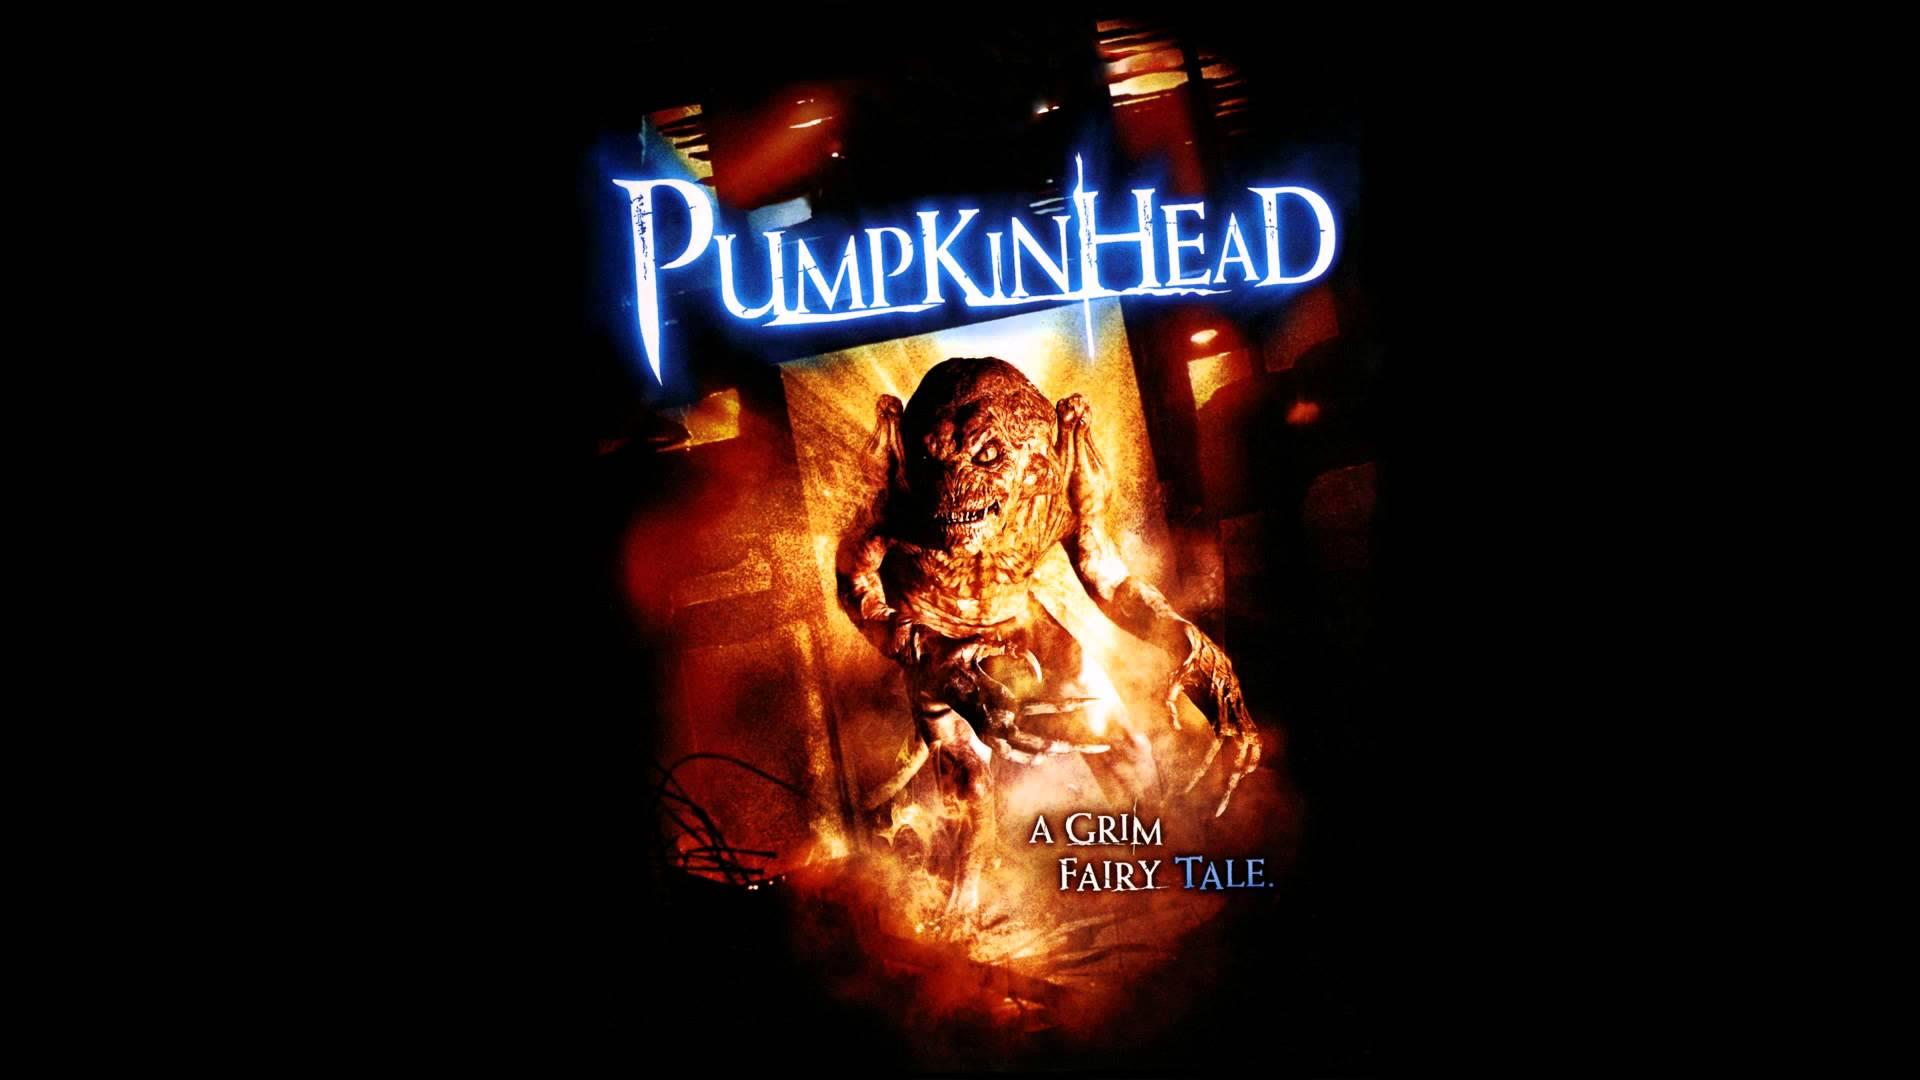 Pumpkinhead meaning